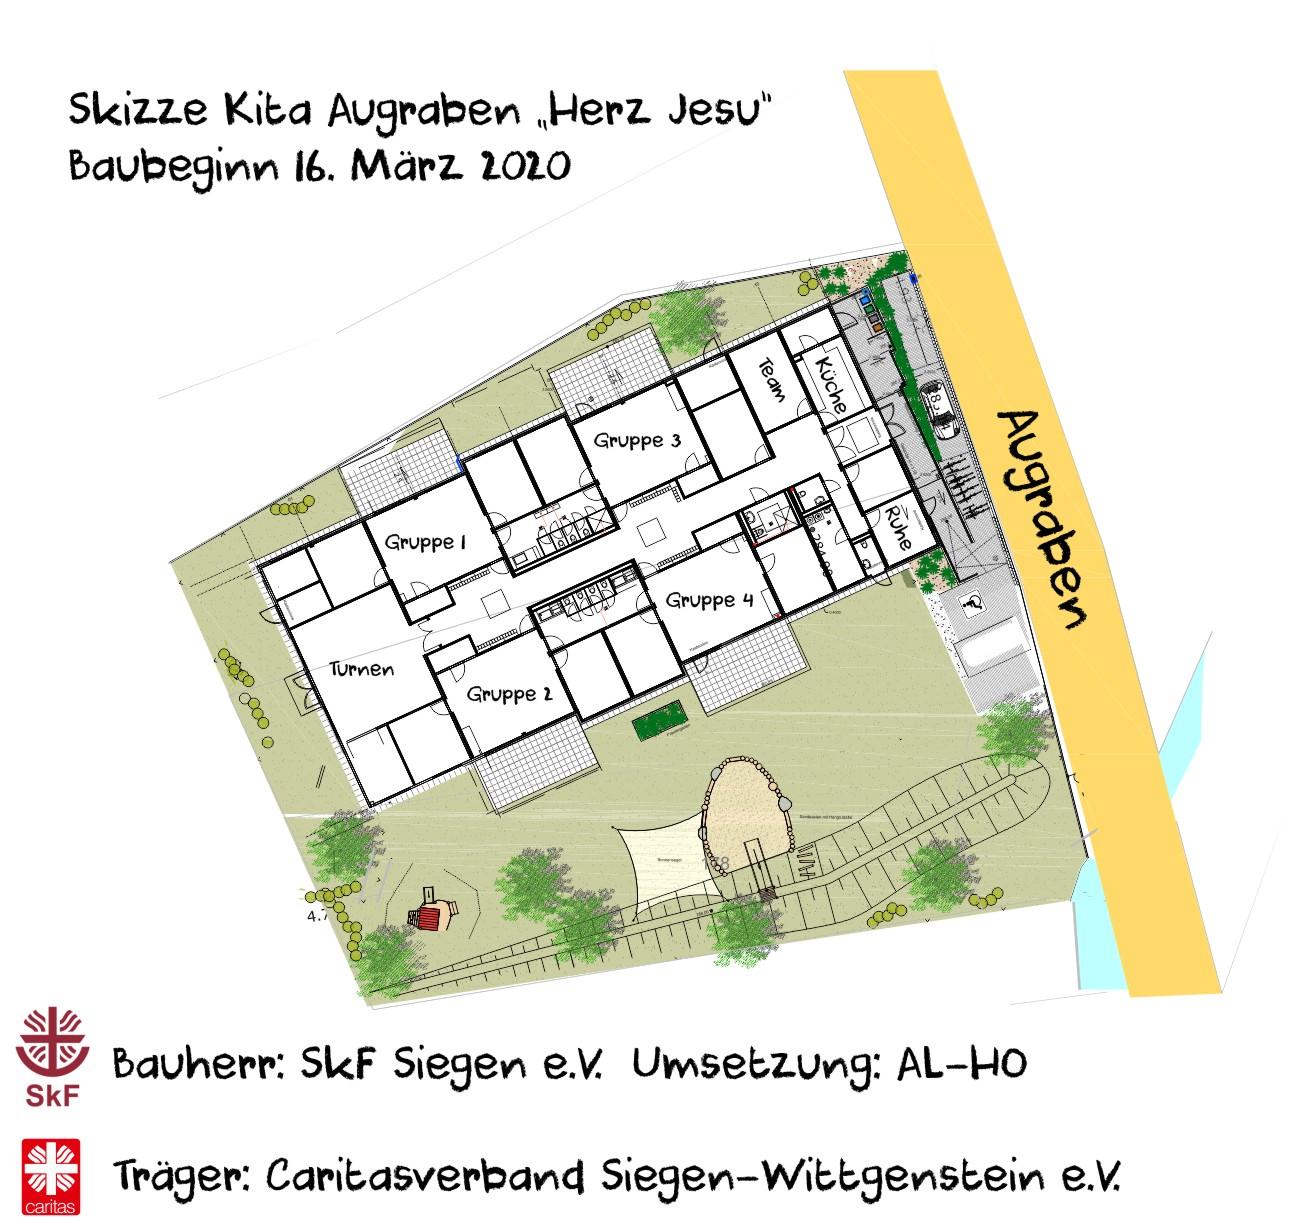 "Skizze Kita Augraben ""Herz Jesu"" Baubeginn 16.MNärz 2020"